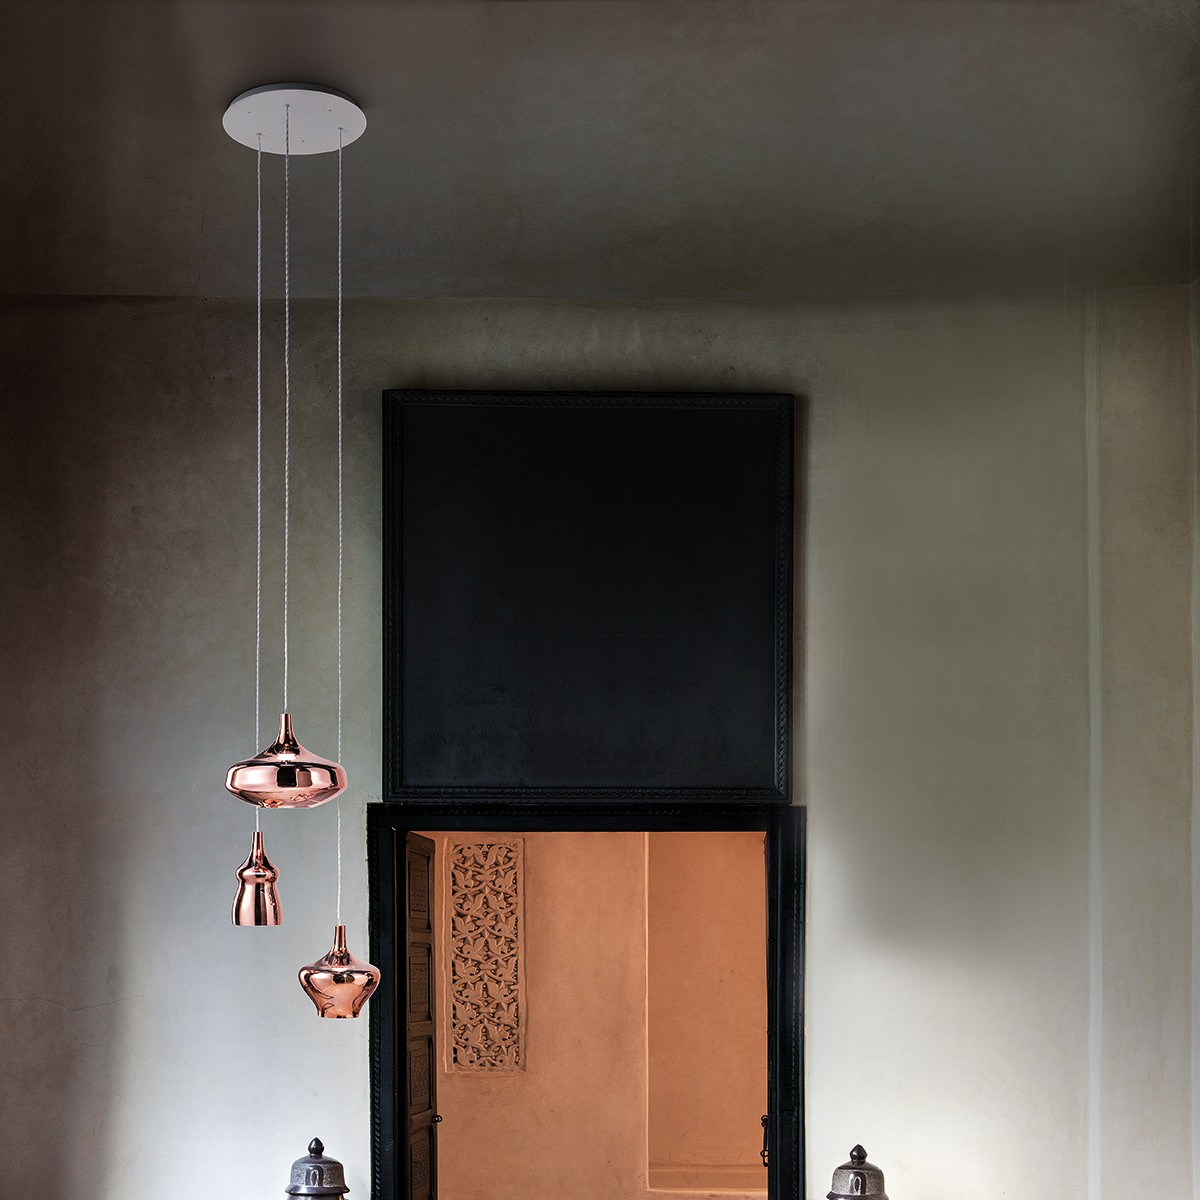 Studio Italia Design Nostalgia Glas Small/Medium/Large Pendelleuchte 3-flg., Chrom - Rose Gold